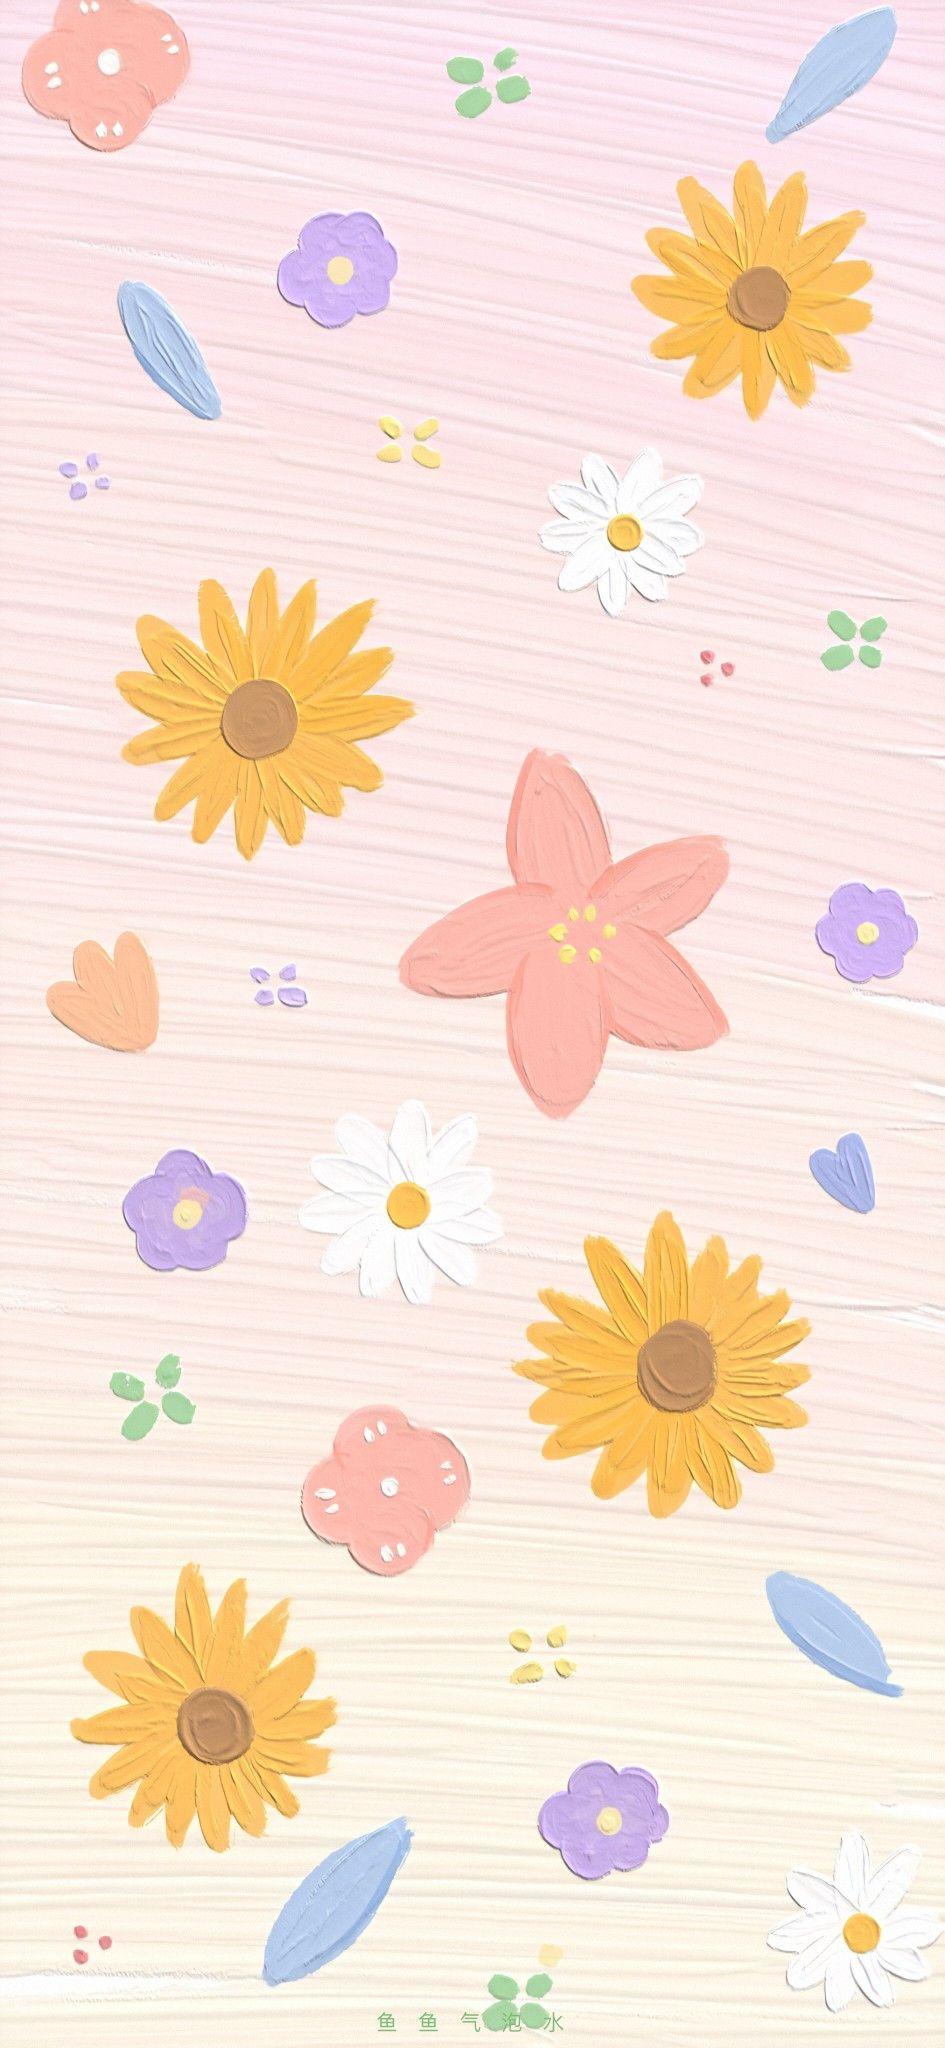 Pin Oleh Parvana Di Hd Cute Wallpaper Kartun Seni Abstrak Poster Bunga